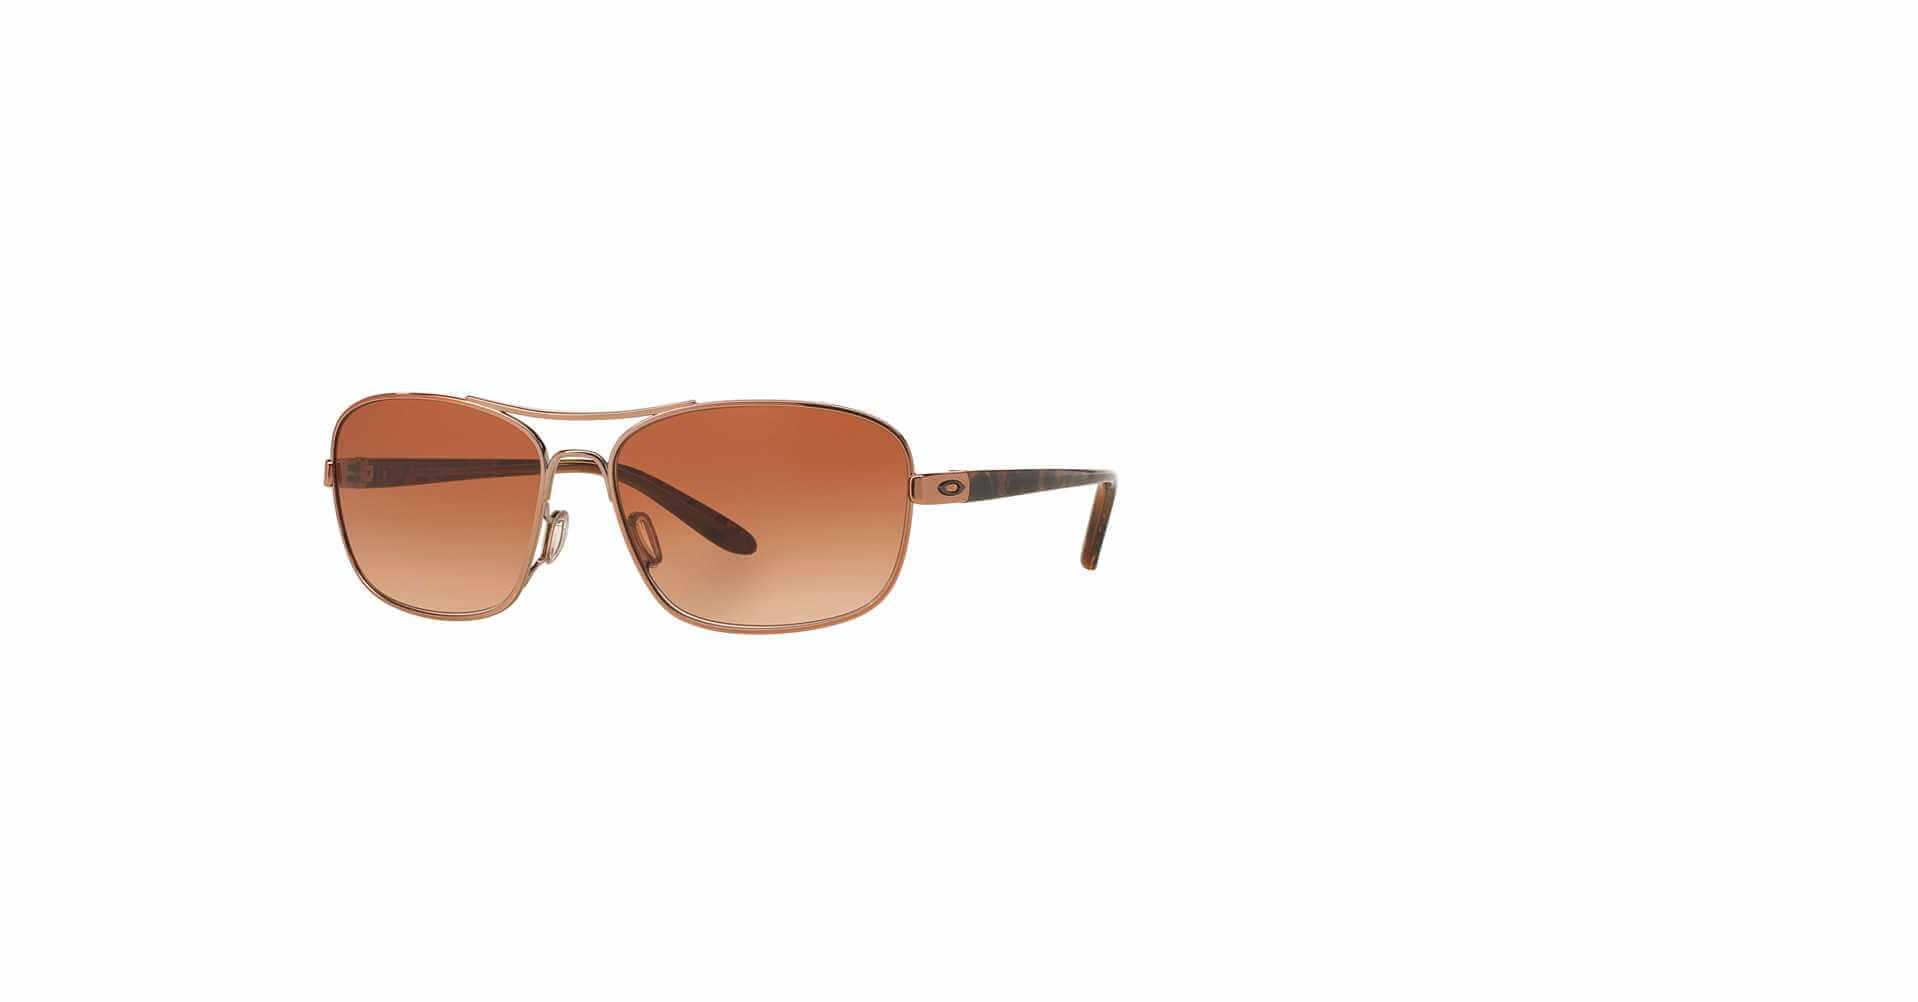 ae5c6ab95b7 Oakley Sanctuary Rose Gold Sunglasses